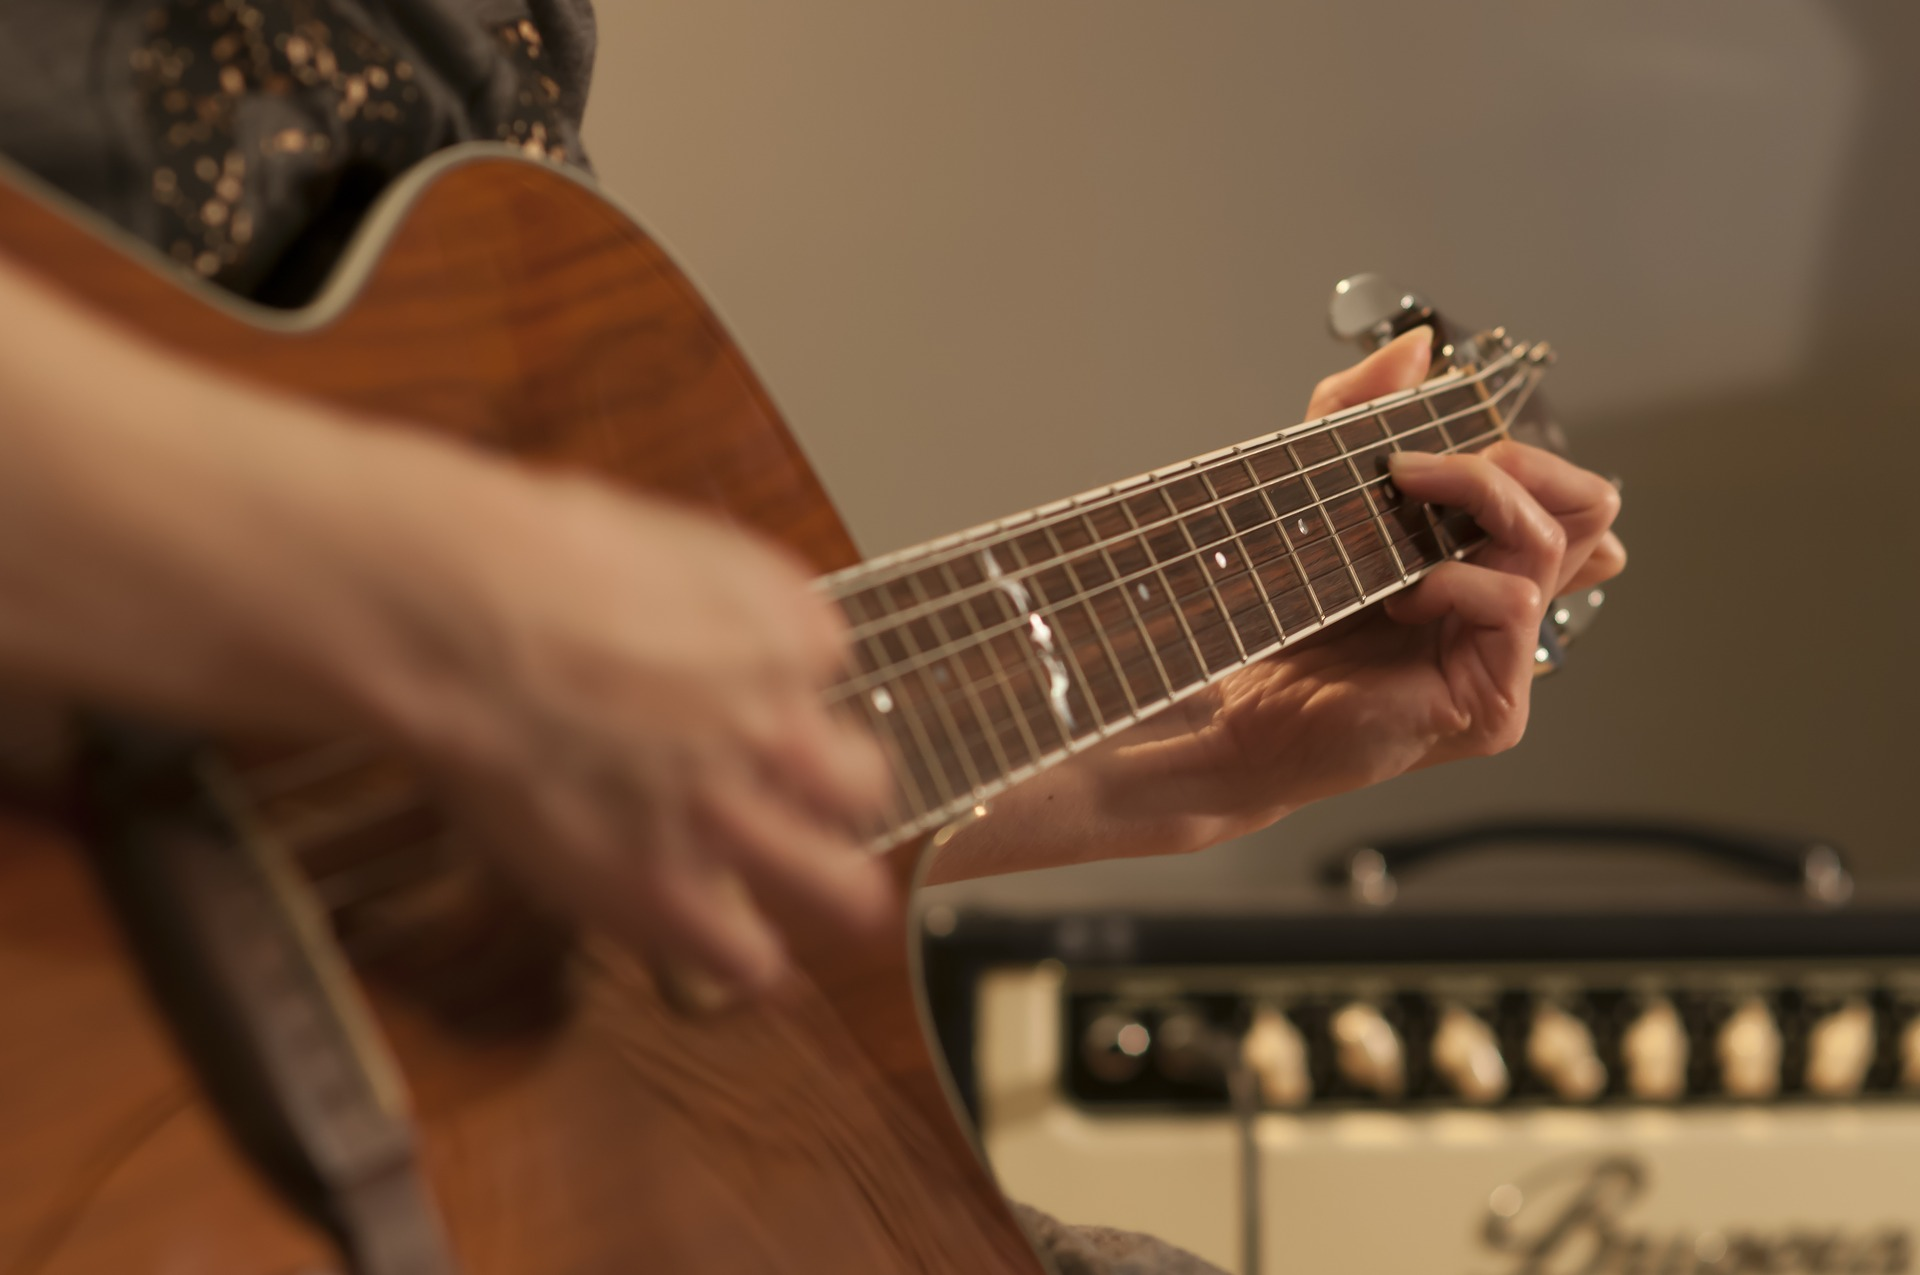 guitar-2183422_1920.jpg